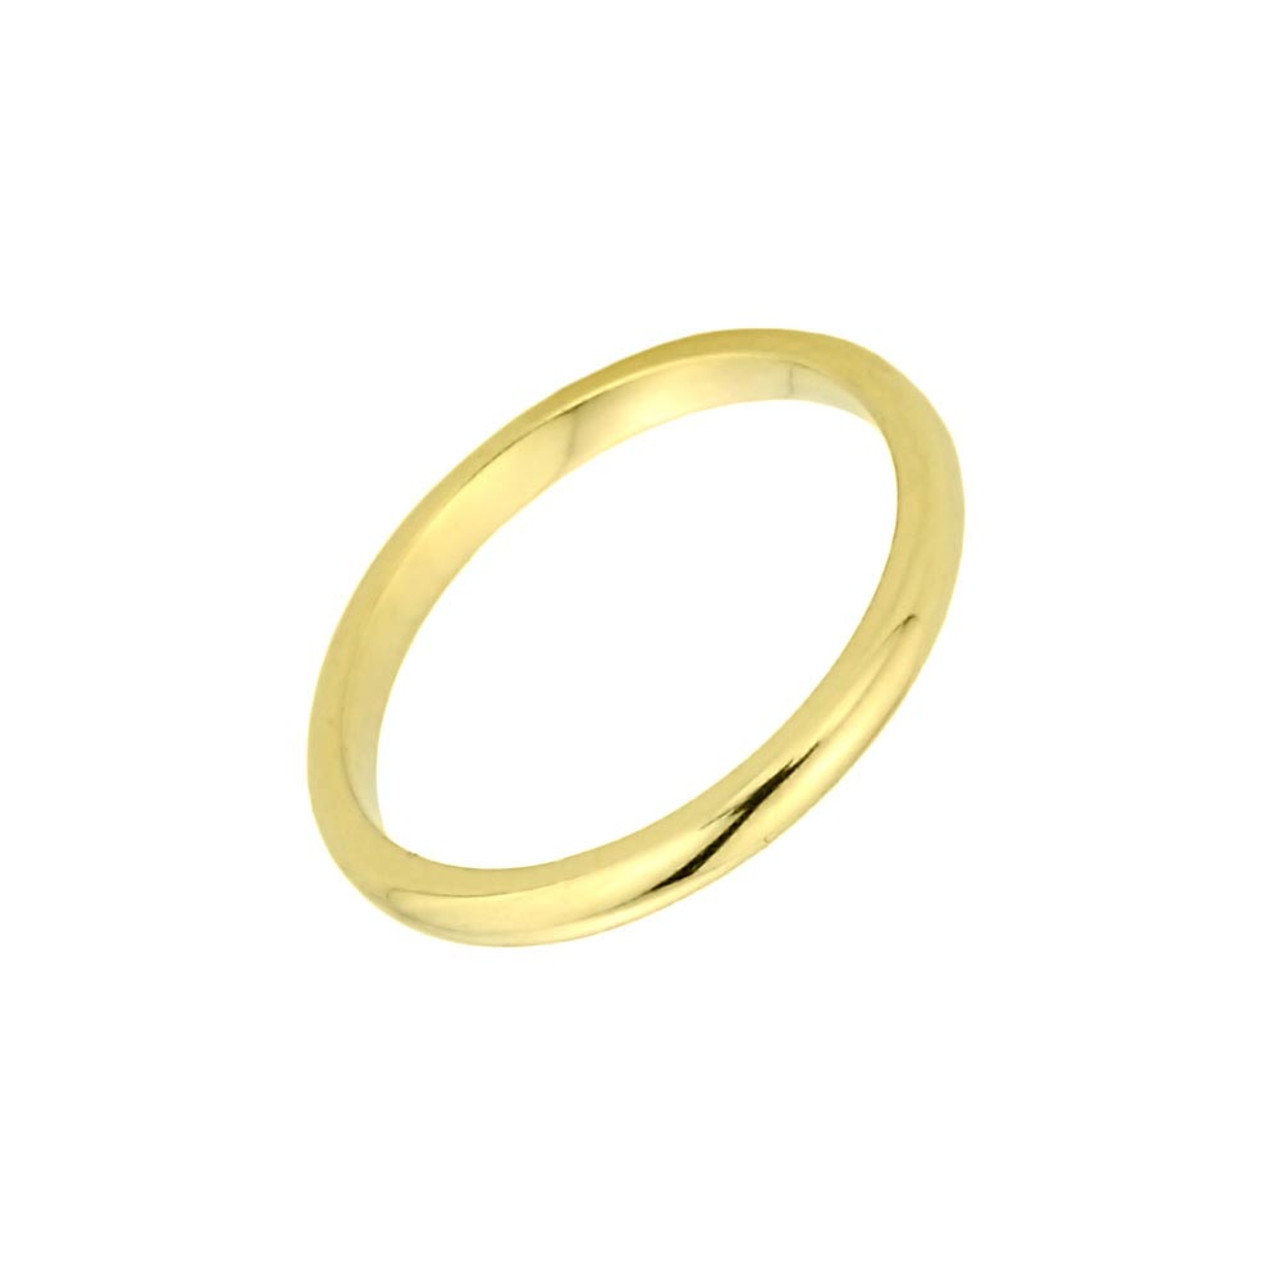 14k gold toe ring size 3.5